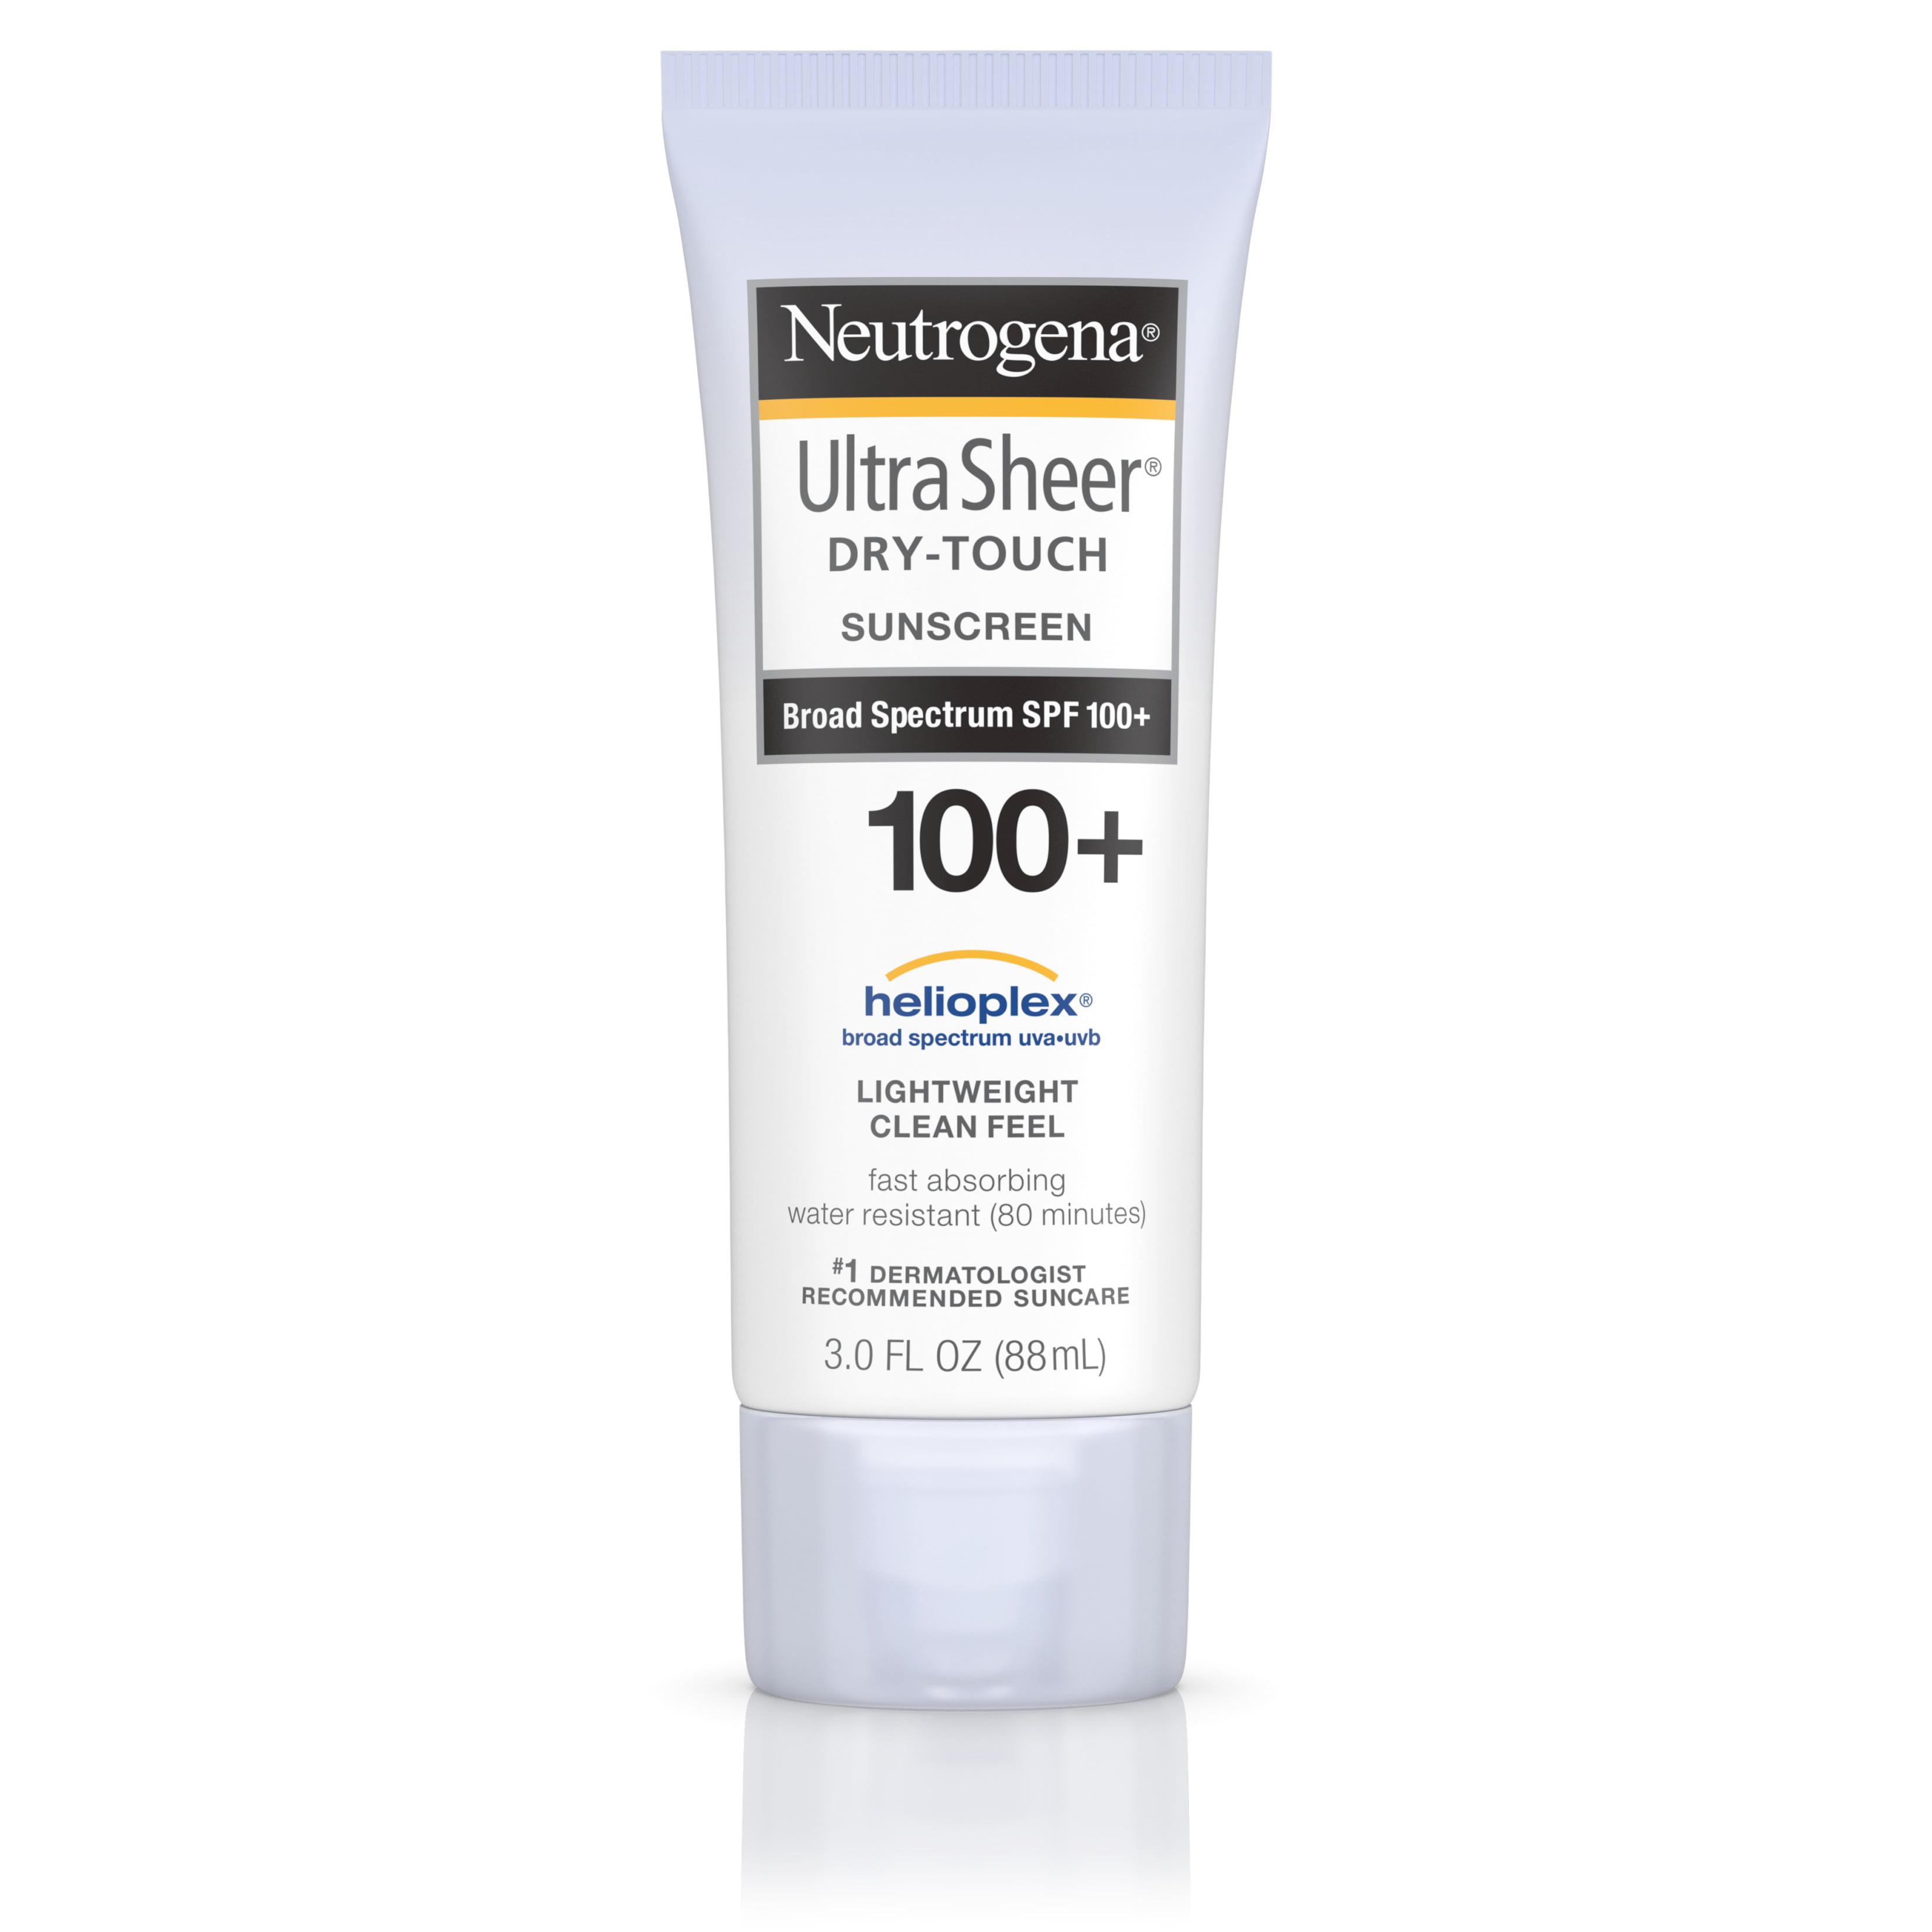 Neutrogena Ultra Sheer Dry-Touch Sunscreen Broad Spectrum SPF 100, 3 Fl. Oz